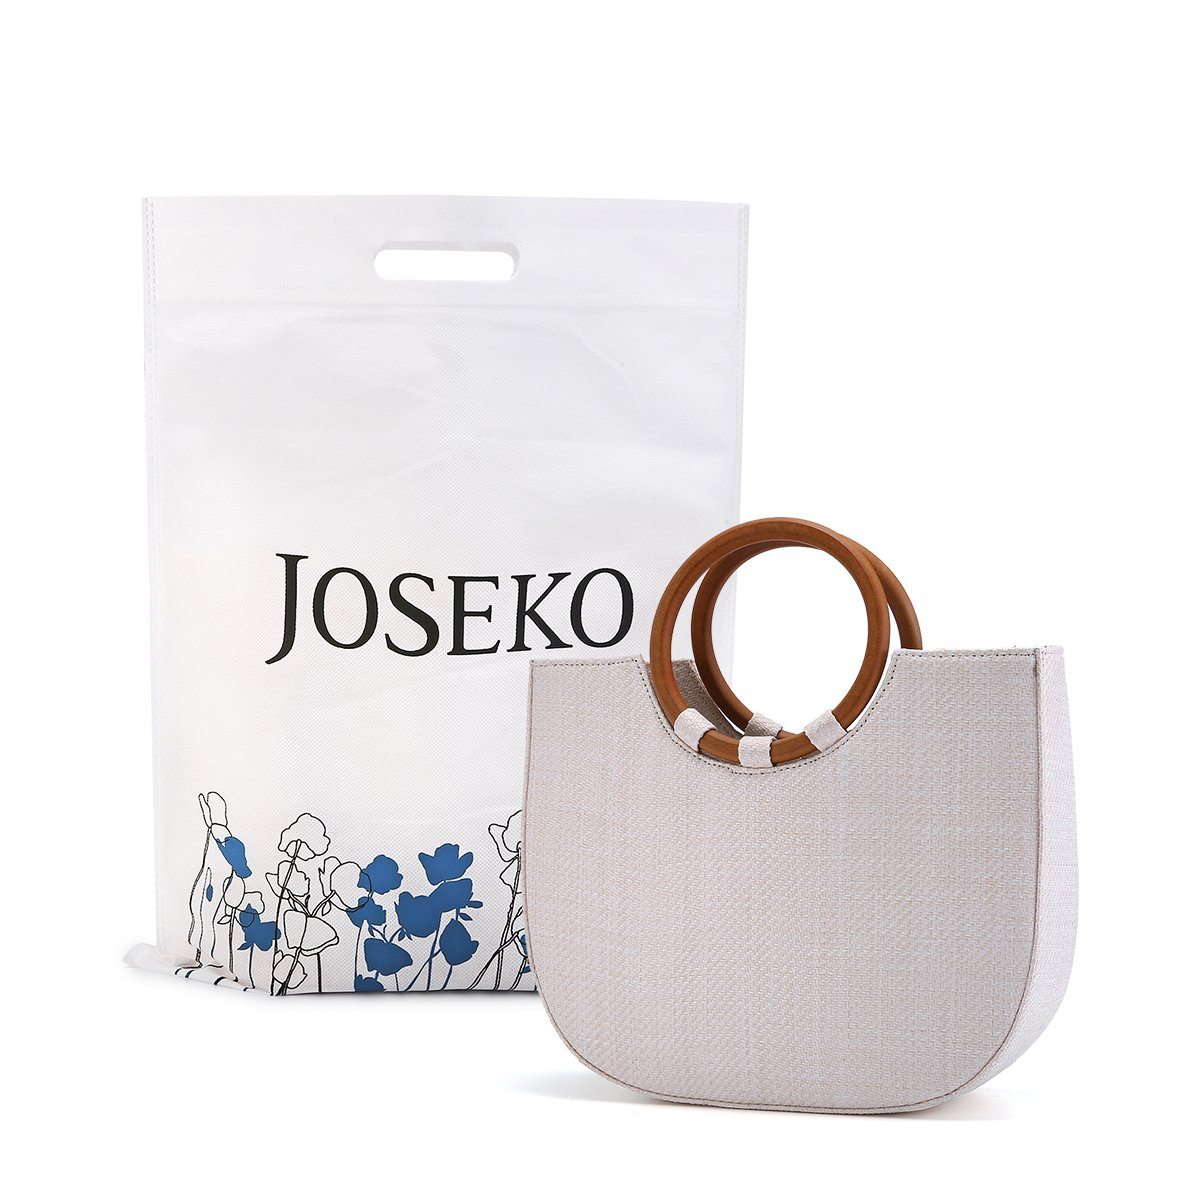 Summer Beach Bag, JOSEKO Womens Straw Handbag Straw Shoulder Bag for Beach Travel and Everyday Use White 11.4''L x 3.5''W x 9.8''H